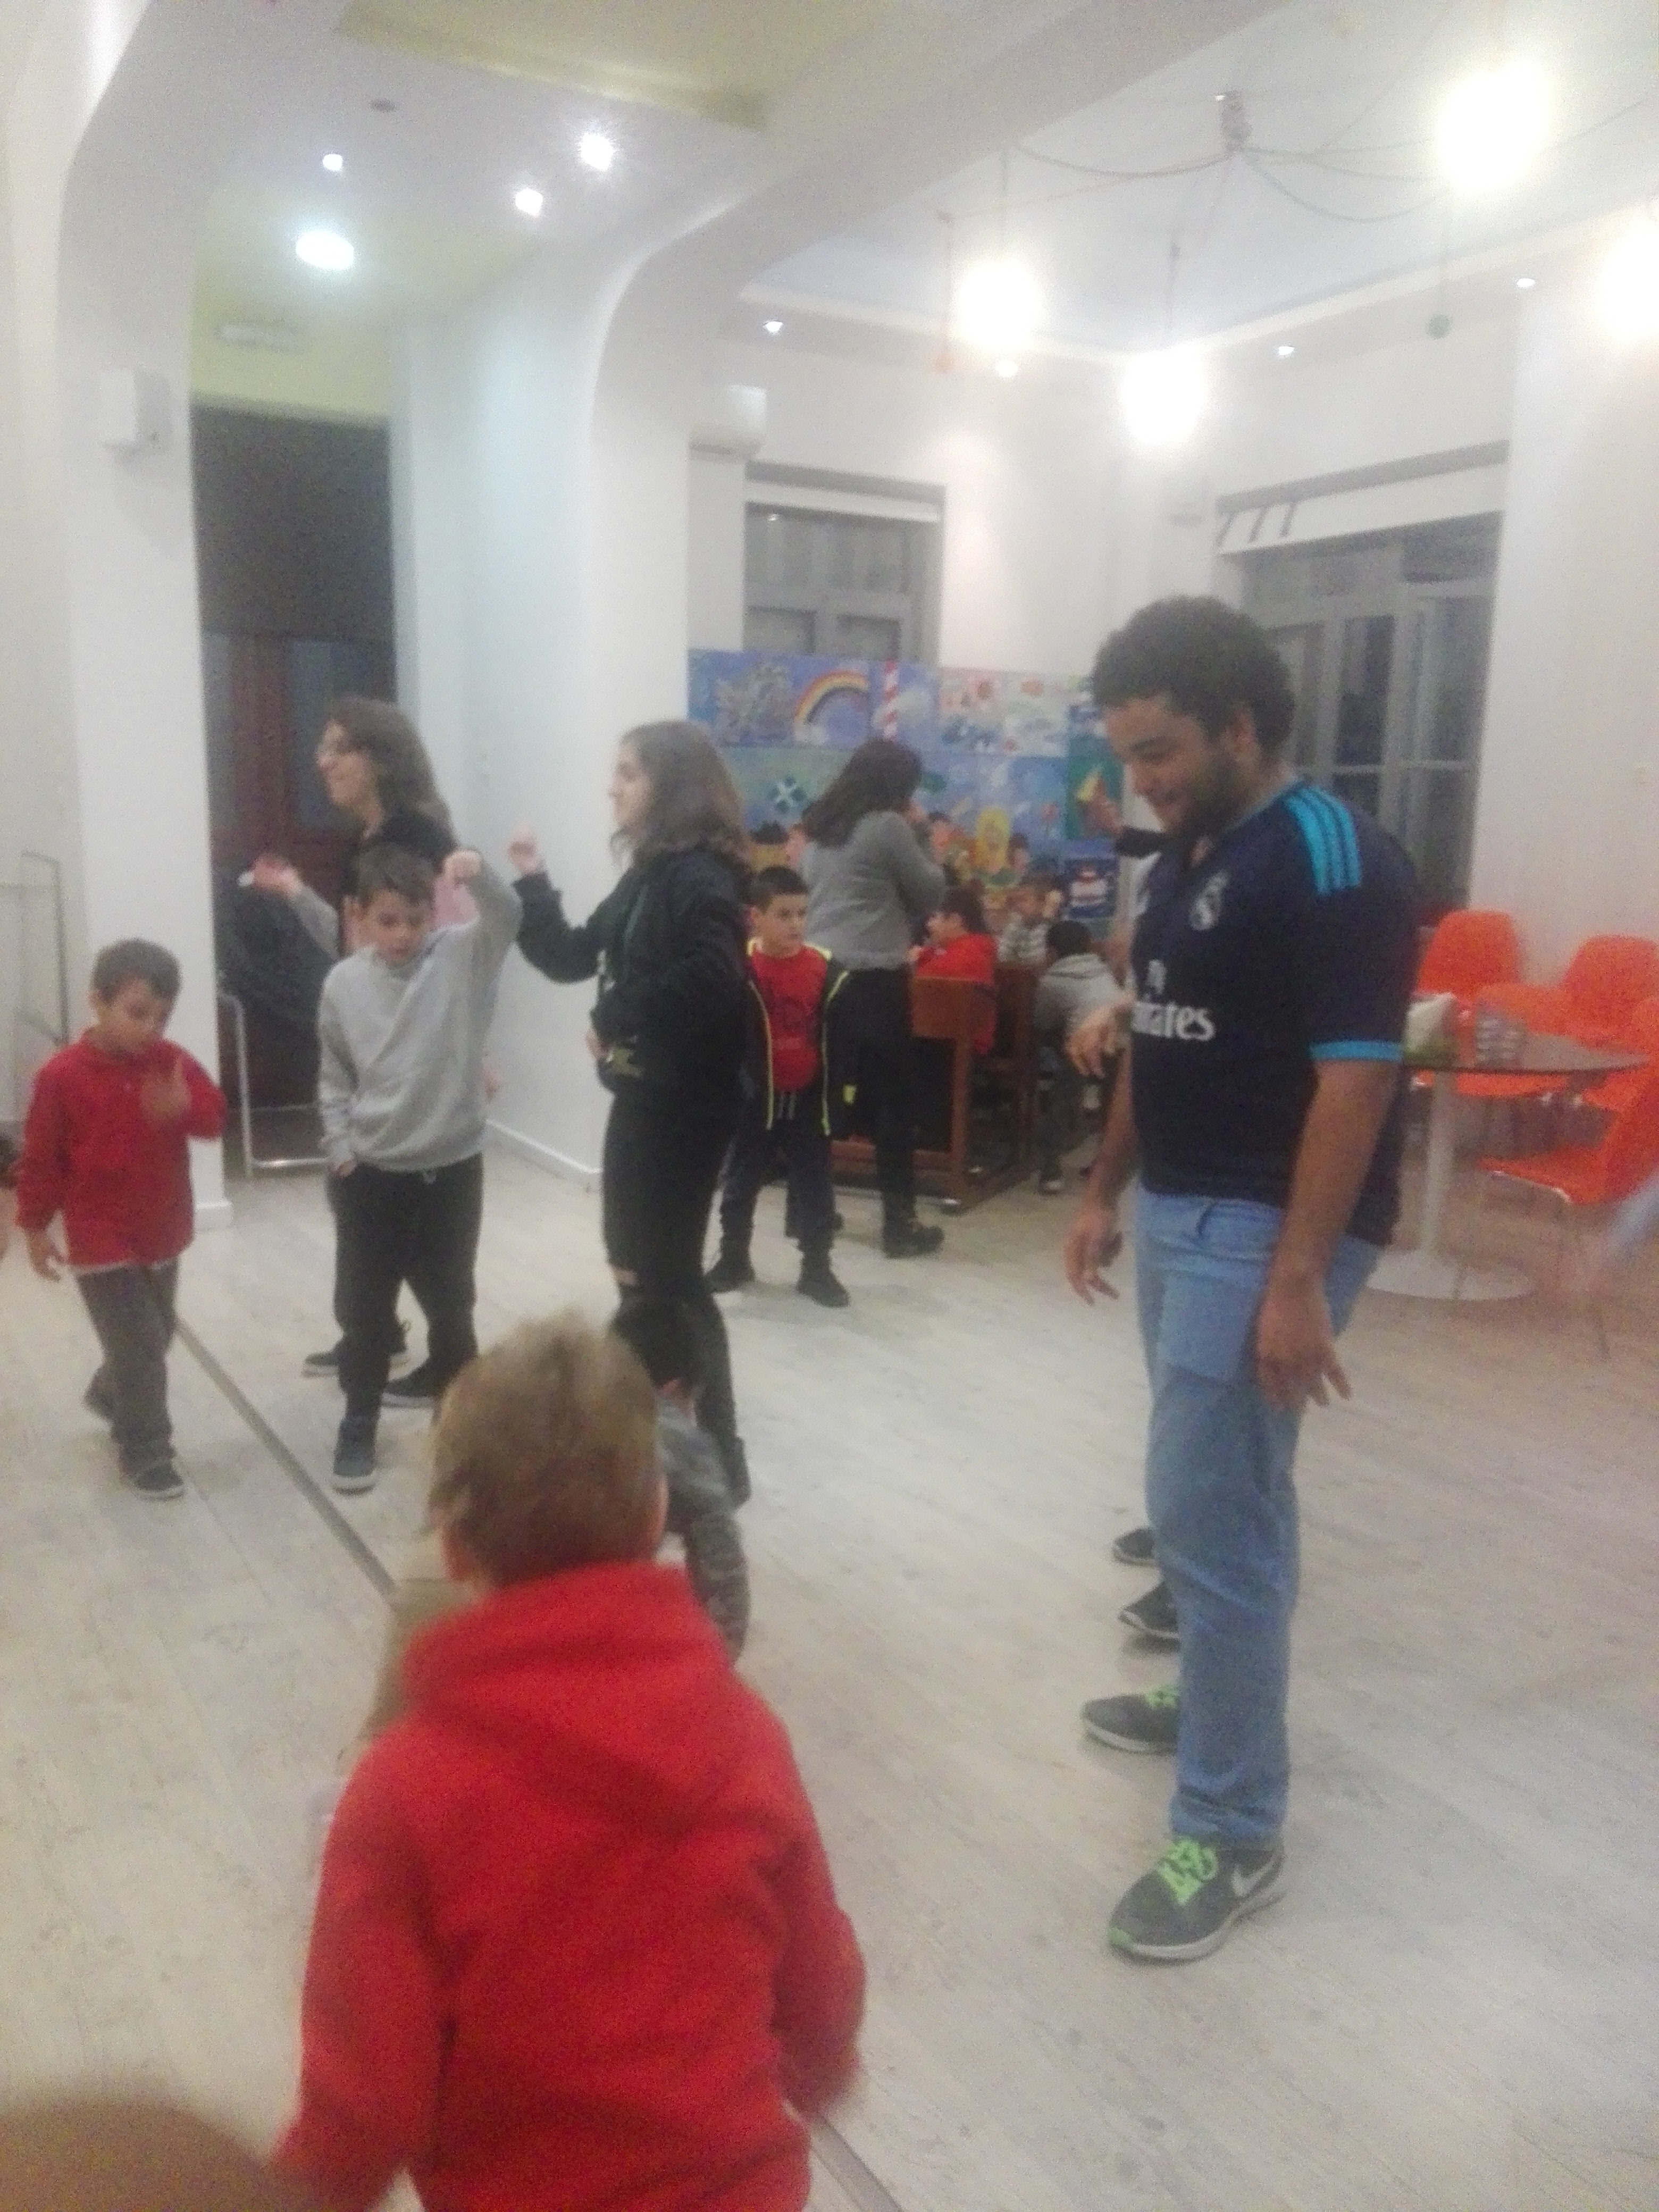 Dancing in Apostoli community center